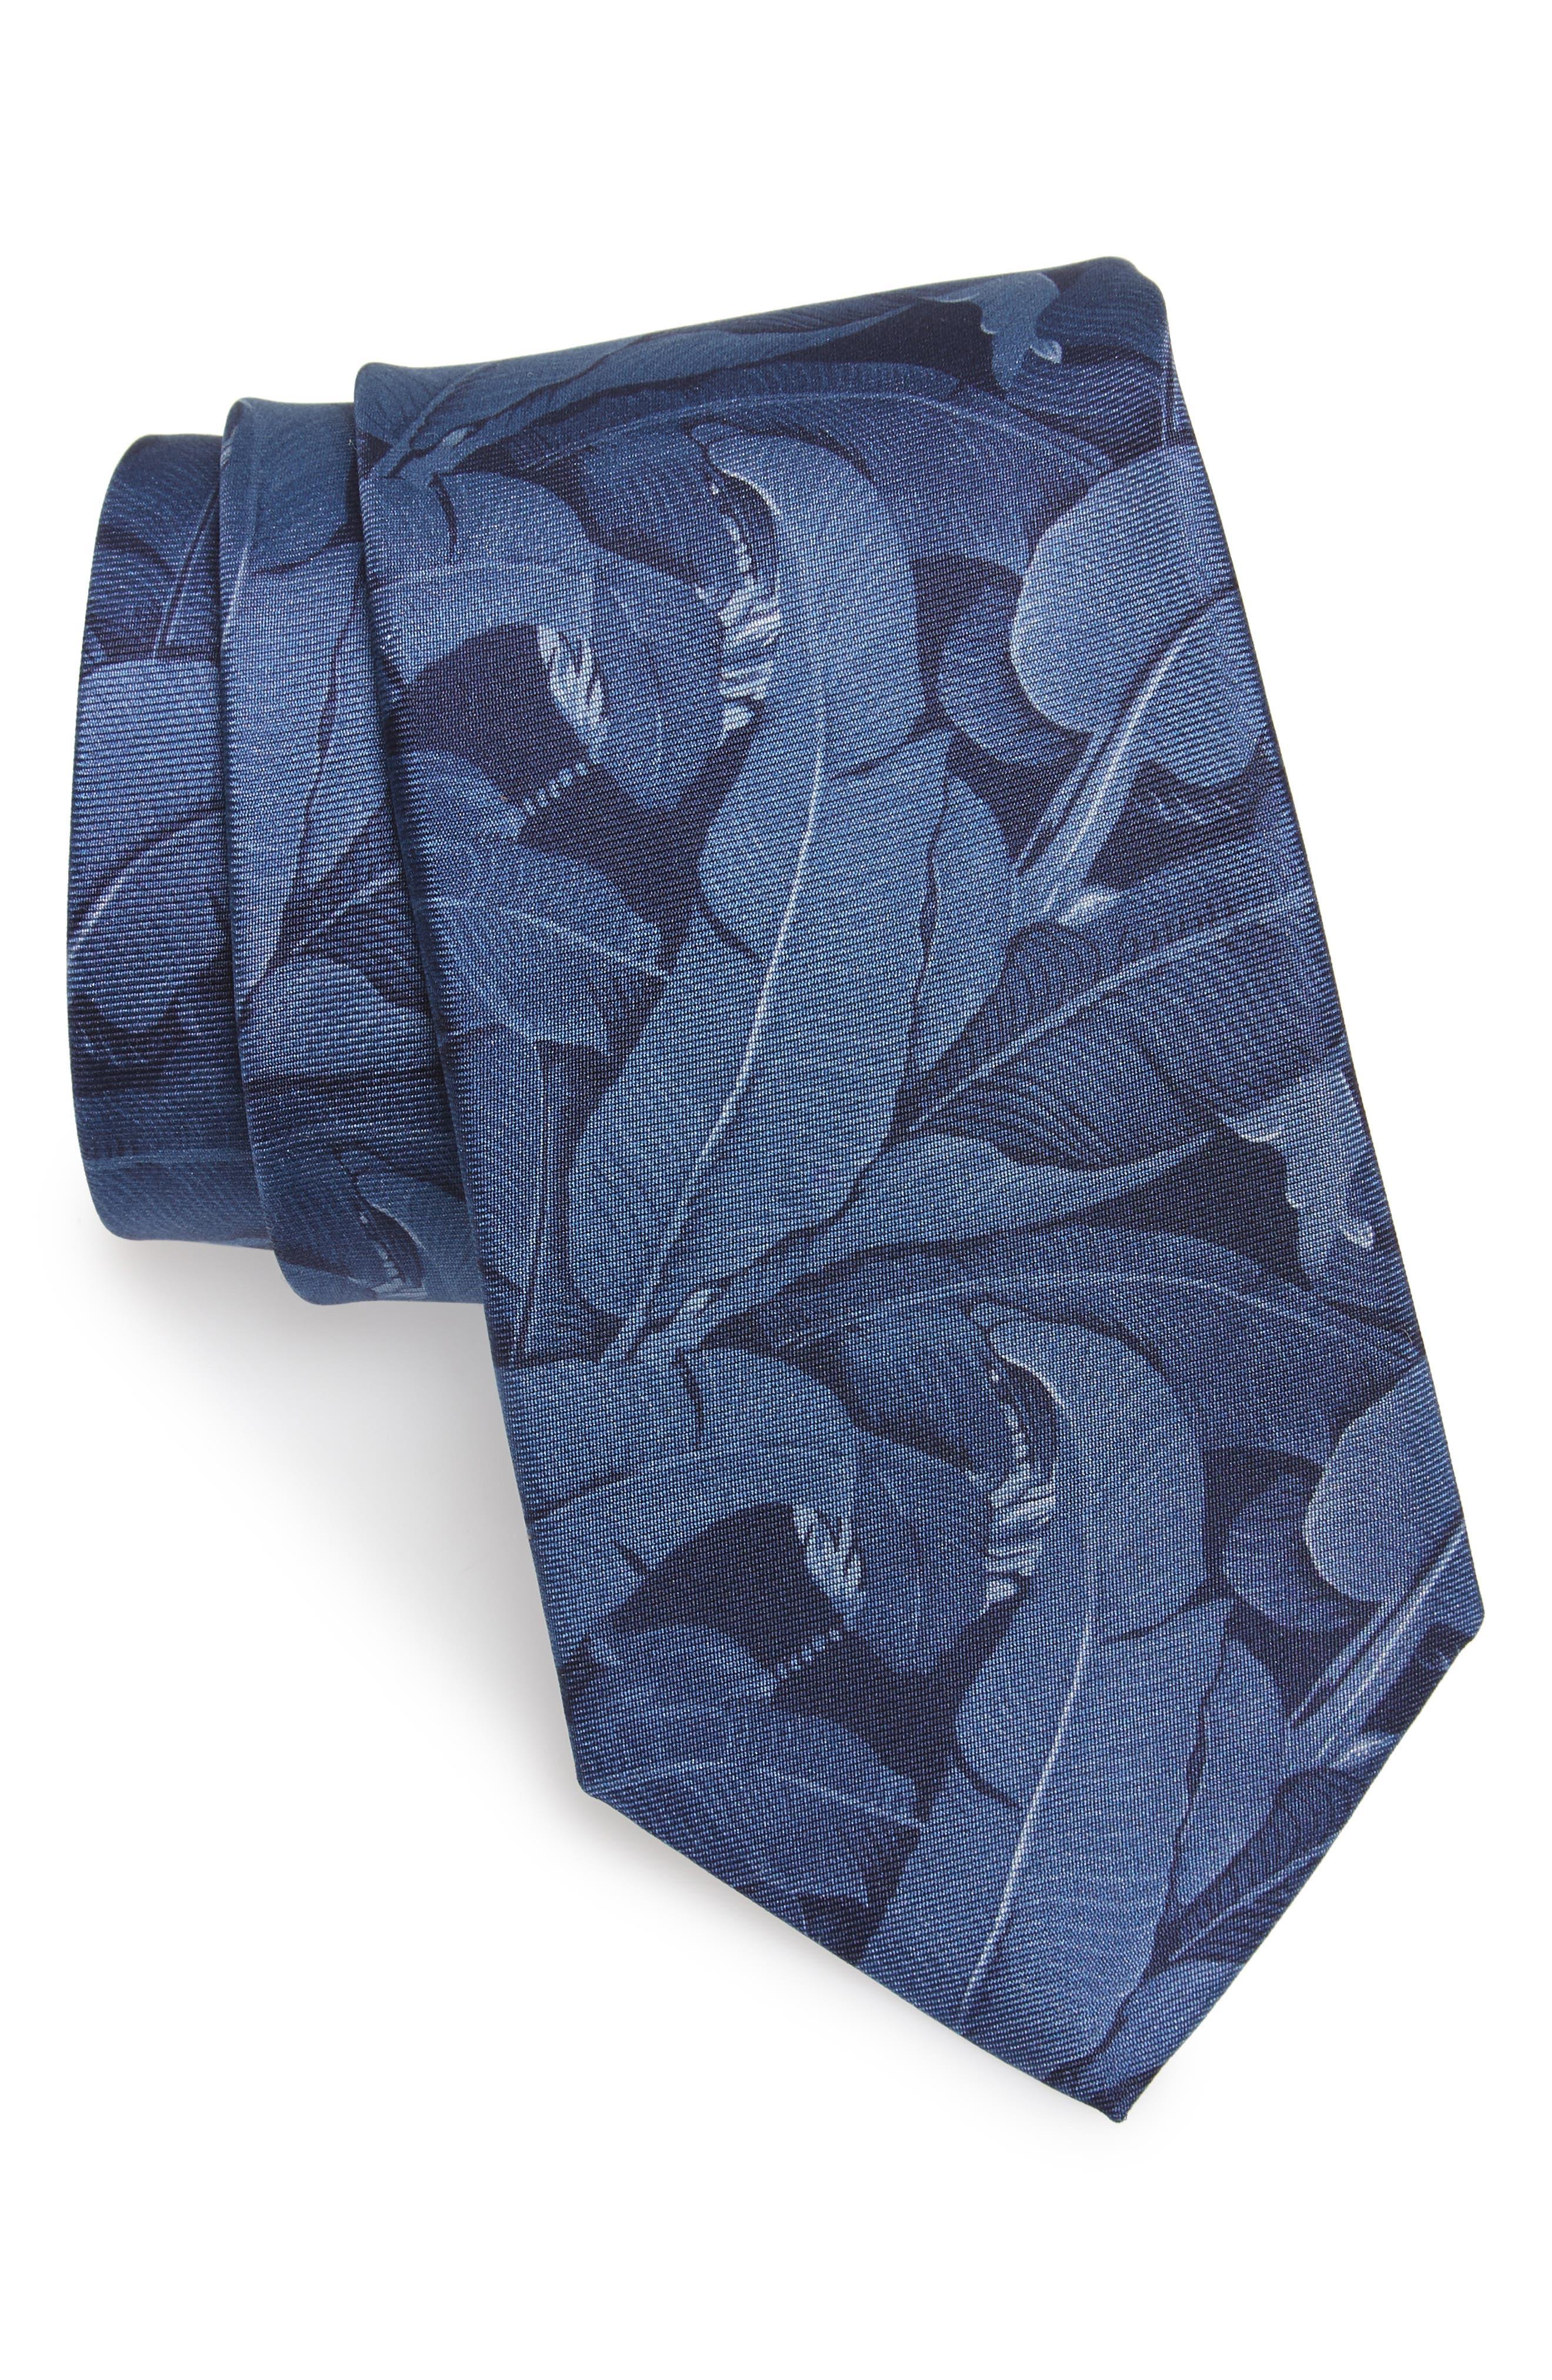 Banana Leaf Silk Tie,                             Main thumbnail 1, color,                             Maritime Blue